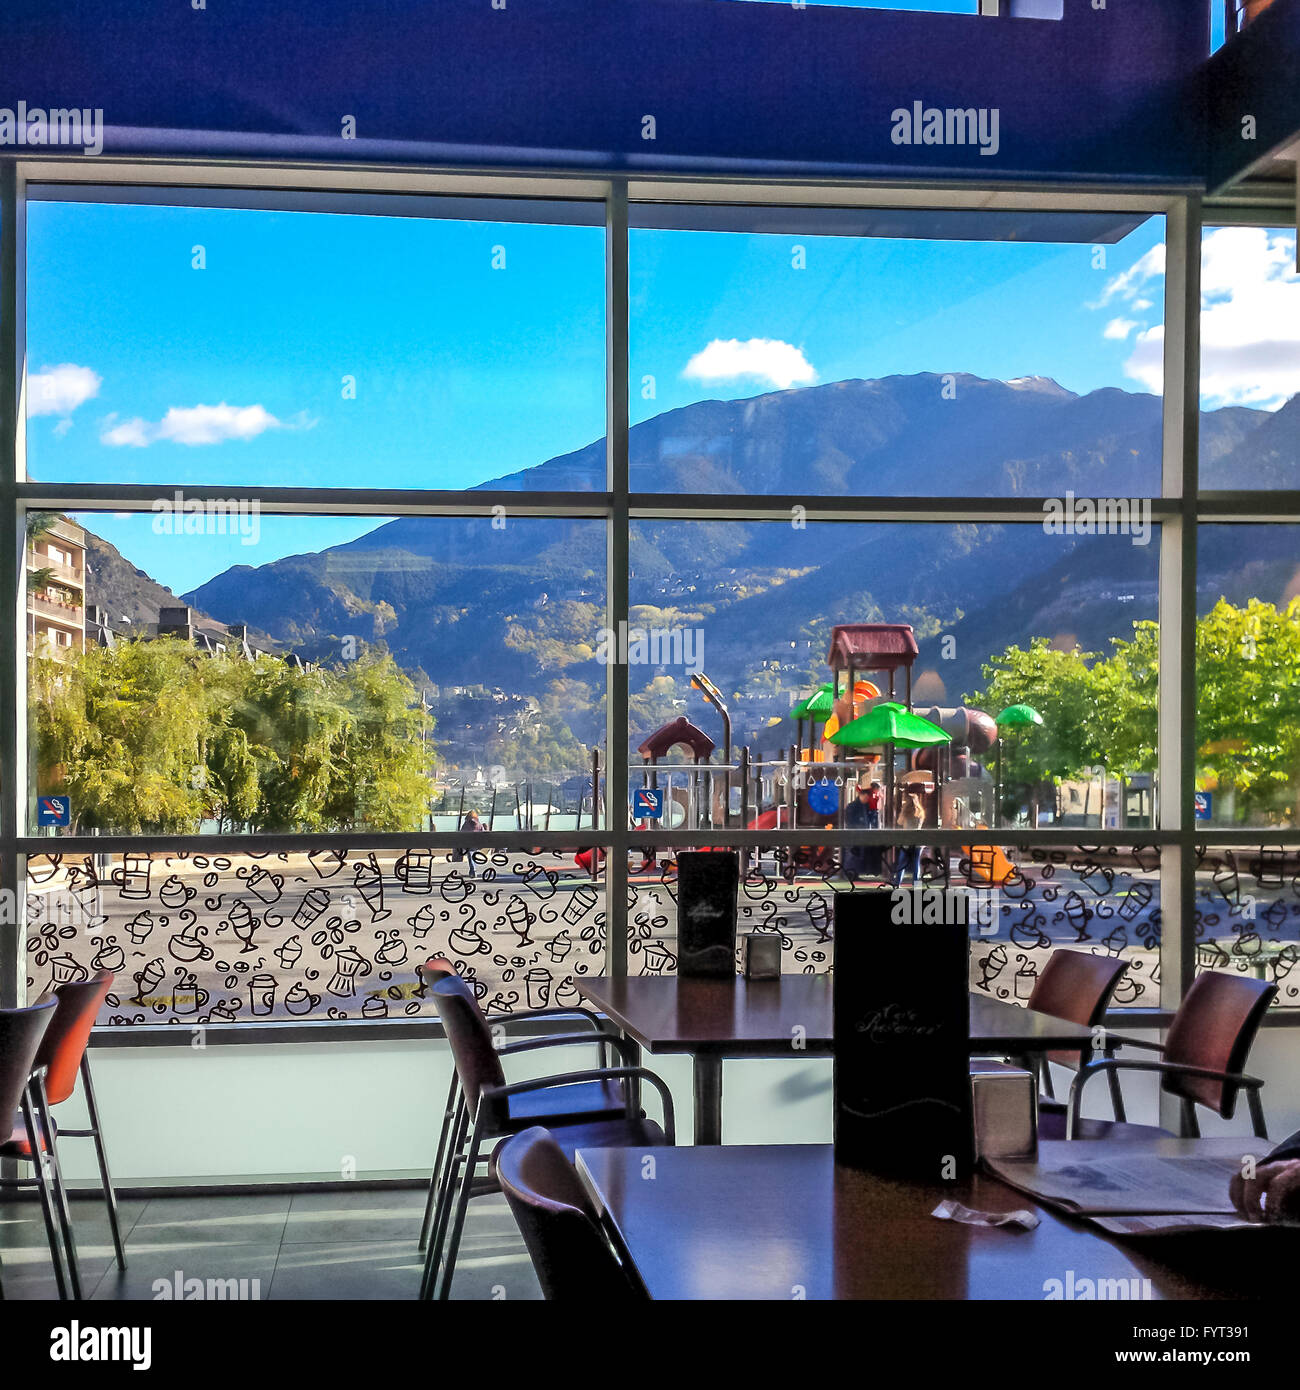 Rastaurant-Cafe in Andorra La Vella. Andorra. - Stock Image